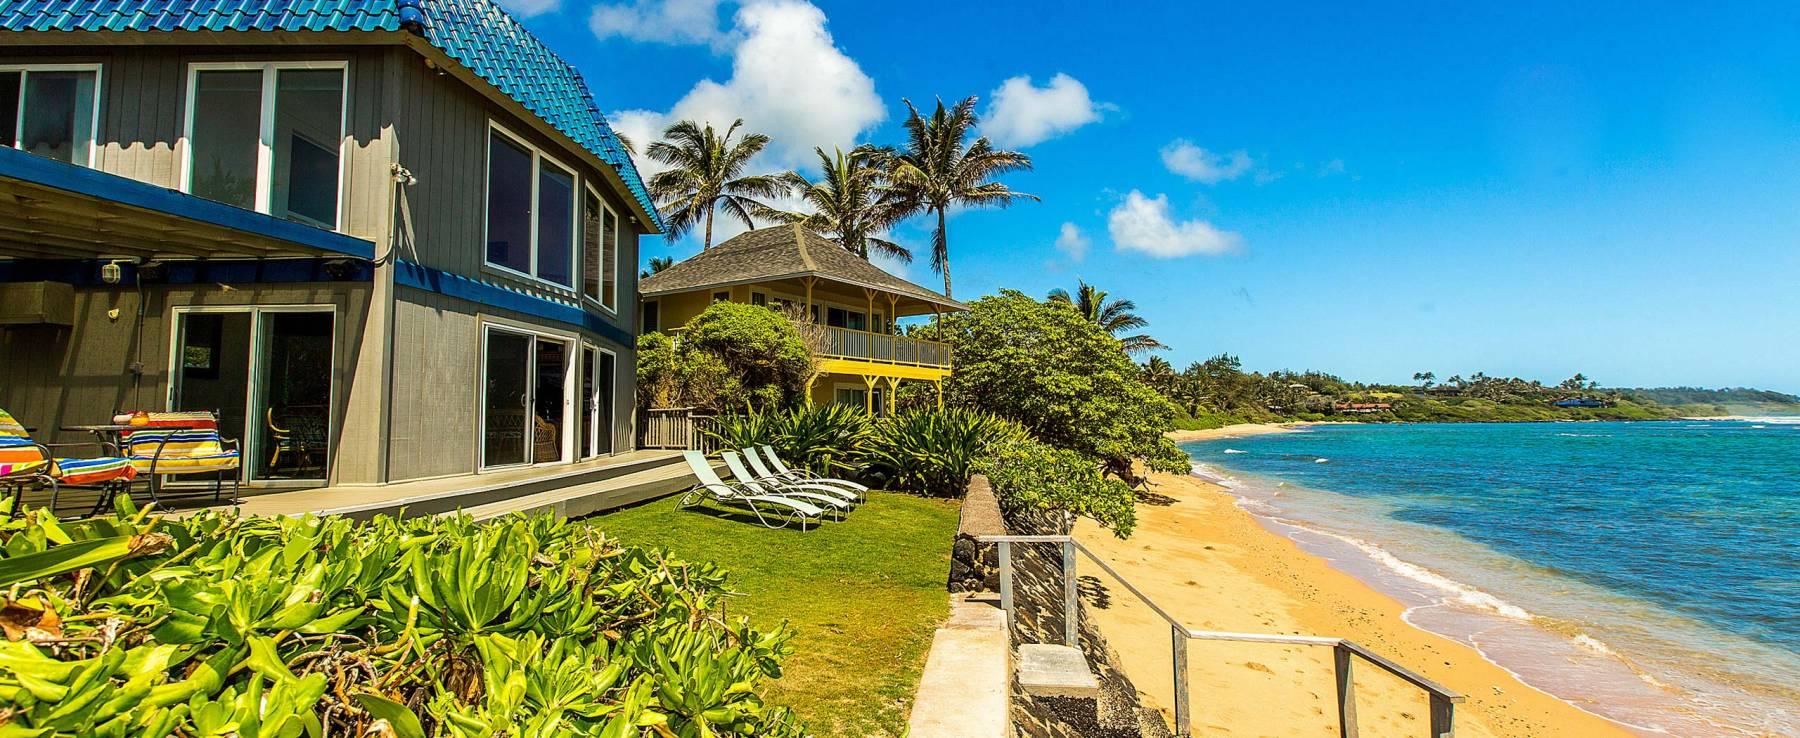 Bond Beach Home